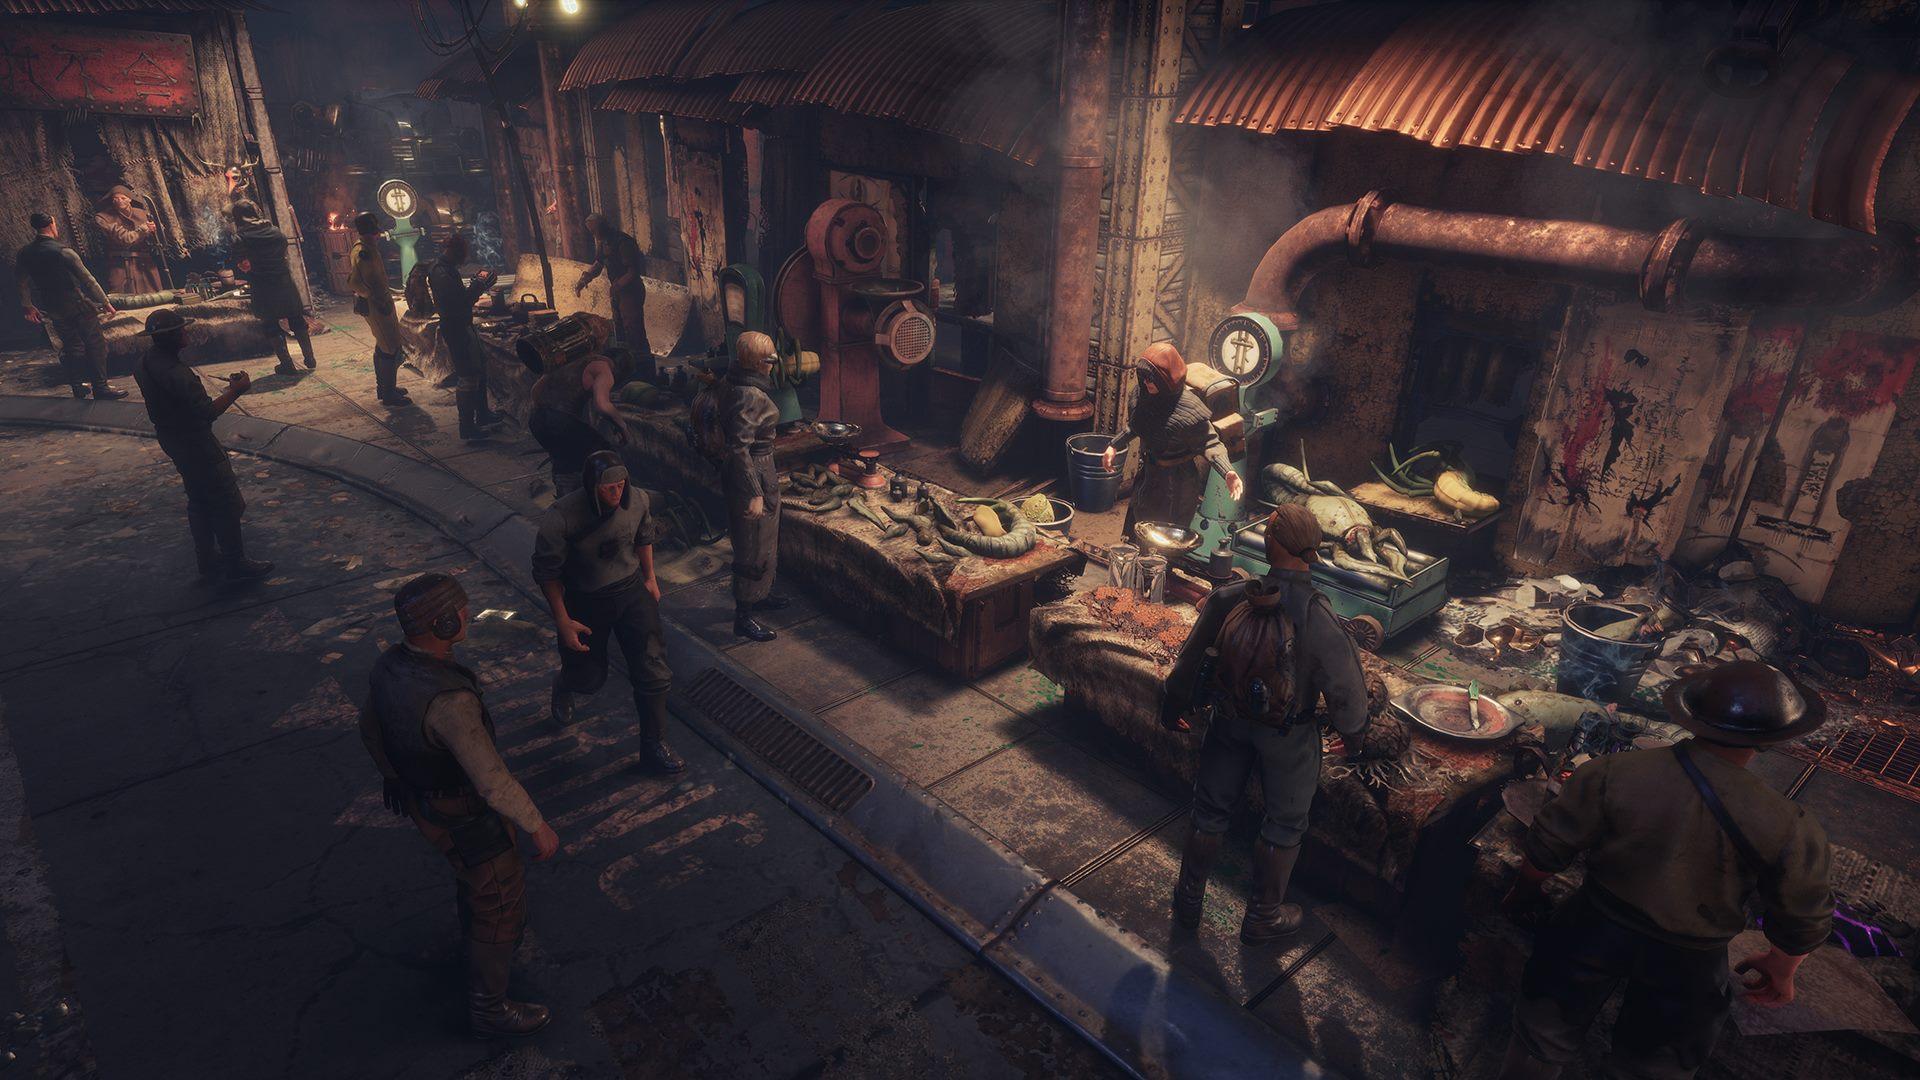 Insomnia: The Ark Screenshot 5 - Bilderquelle: HeroCraft